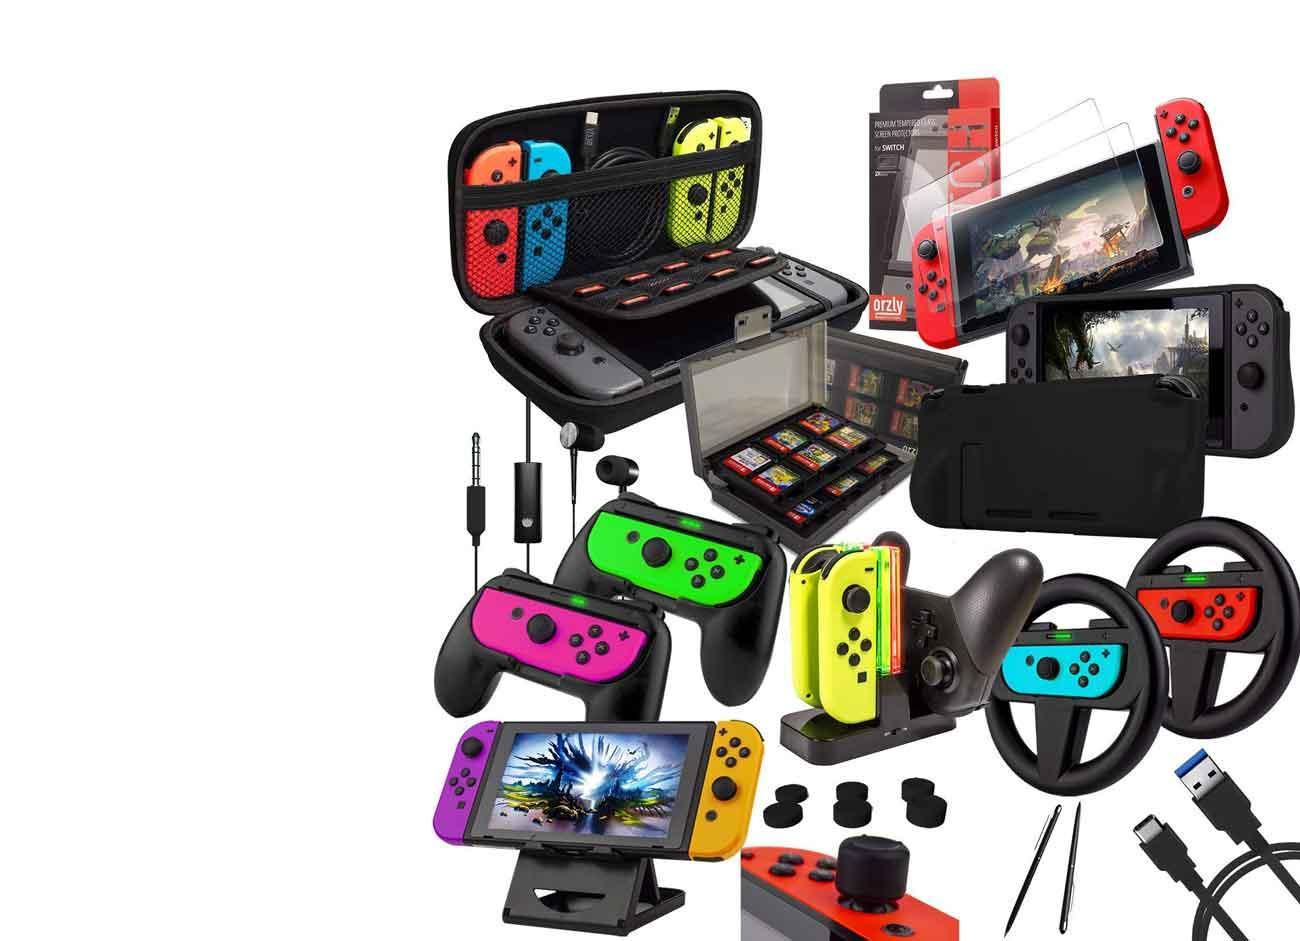 Pack de accesorios para Nintendo Switch